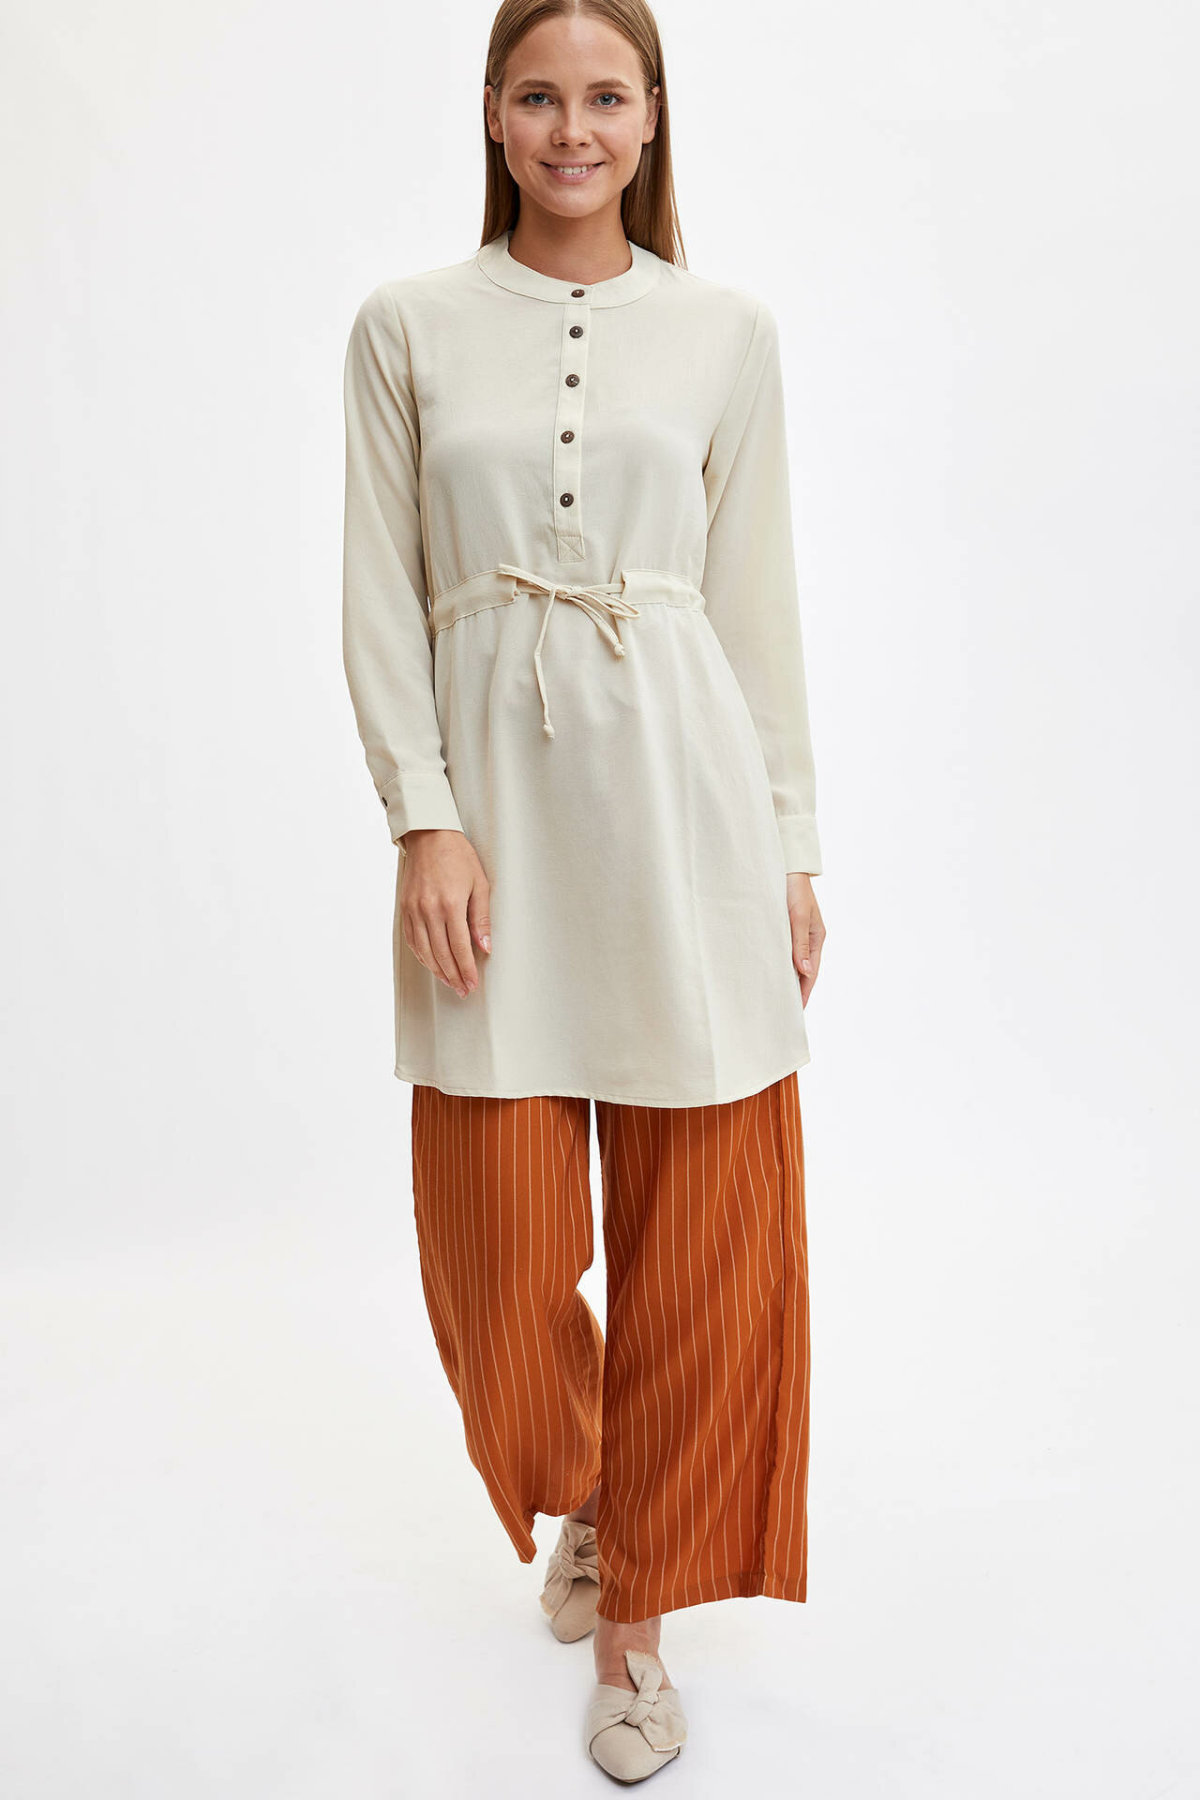 DeFacto Women Elegant Striped High Waist Wide Leg Pants Female Belt High Quality Loose Trousers Ladies Spring Autumn L7625AZ19HS